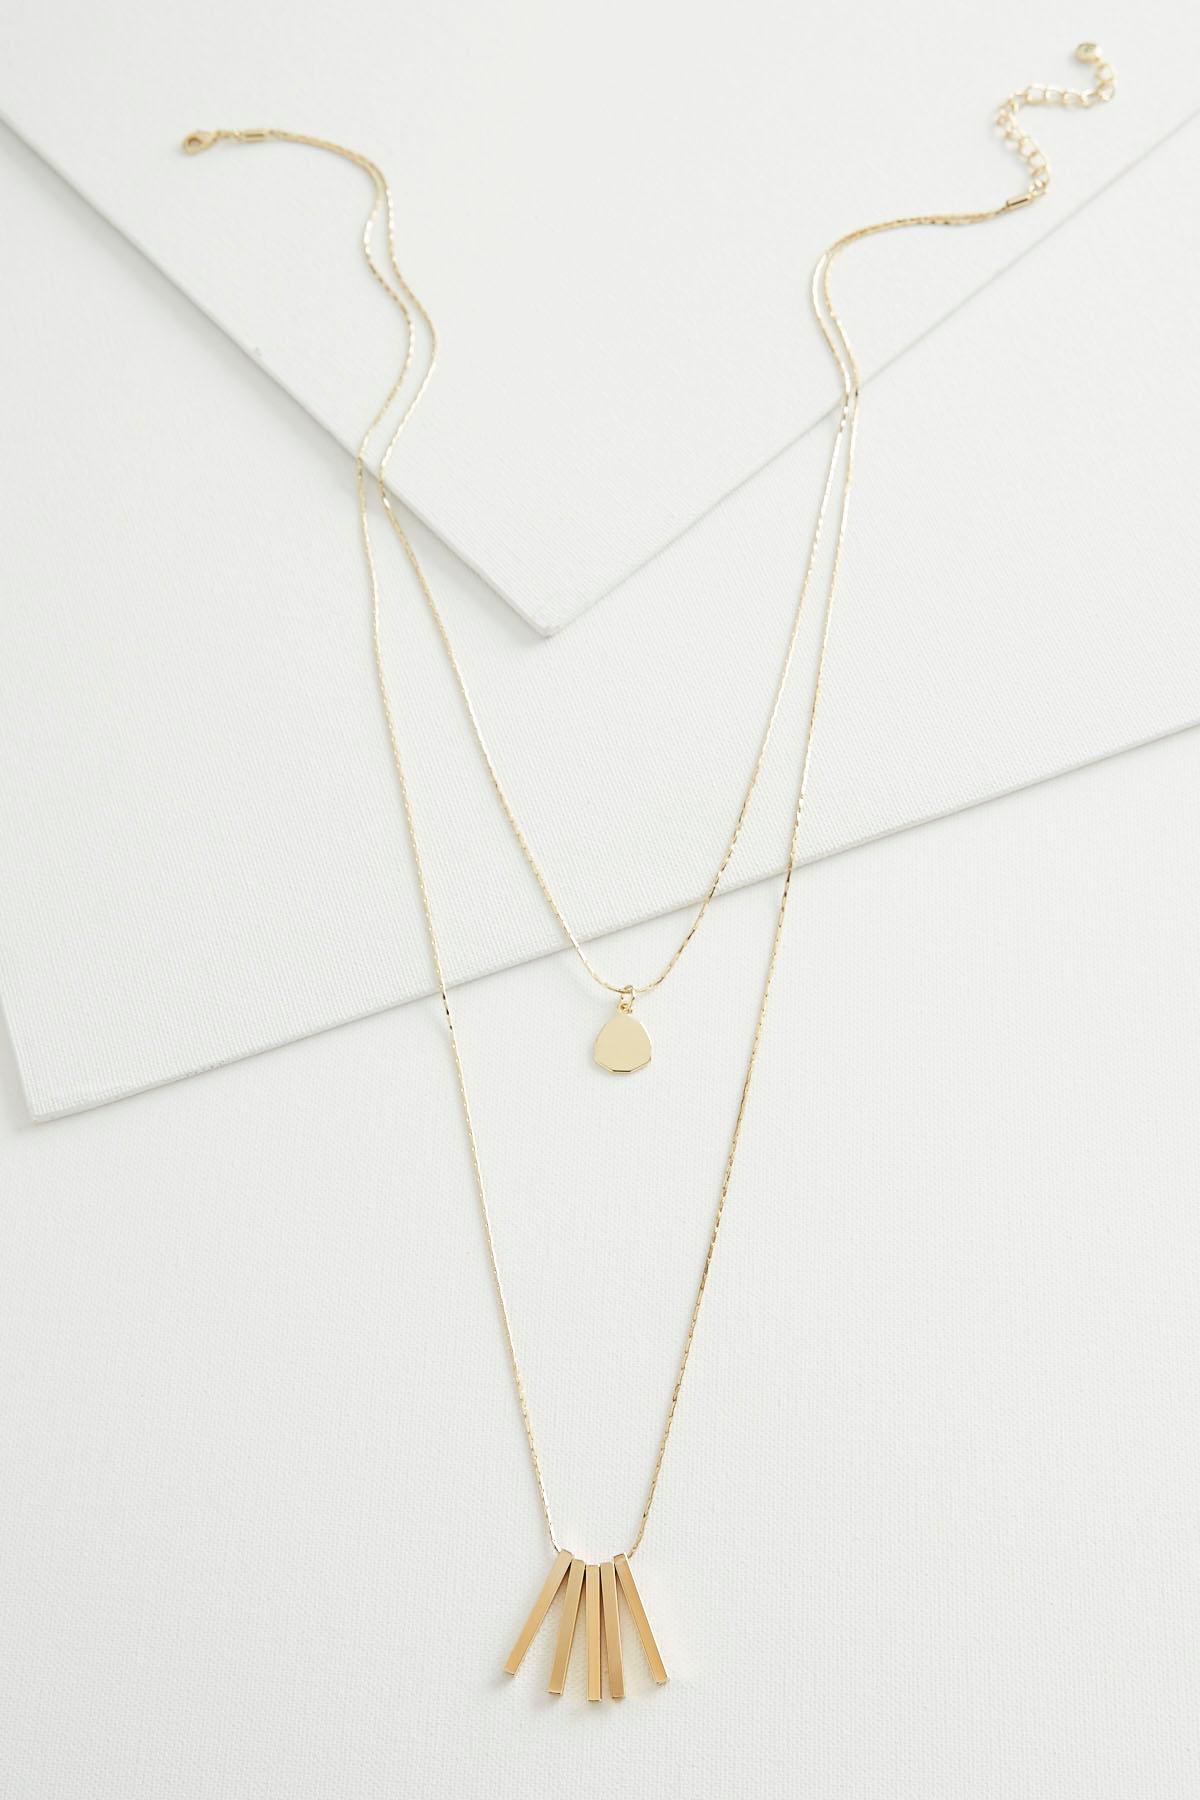 Brass Bar Fringe Layered Necklace